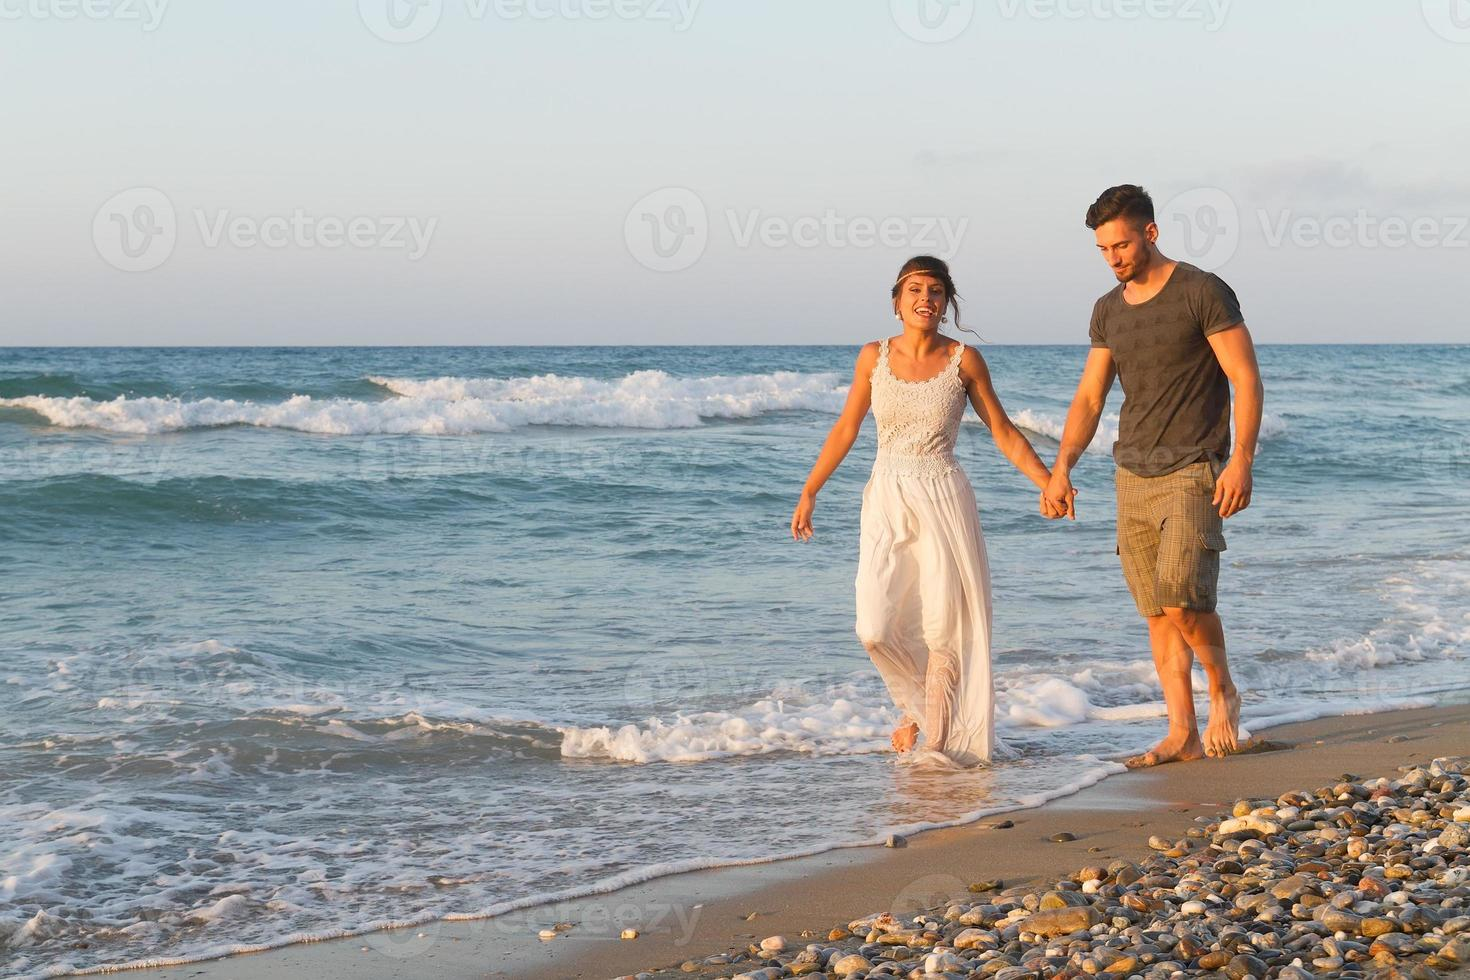 Young couple enjoys walking on a hazy beach at dusk photo